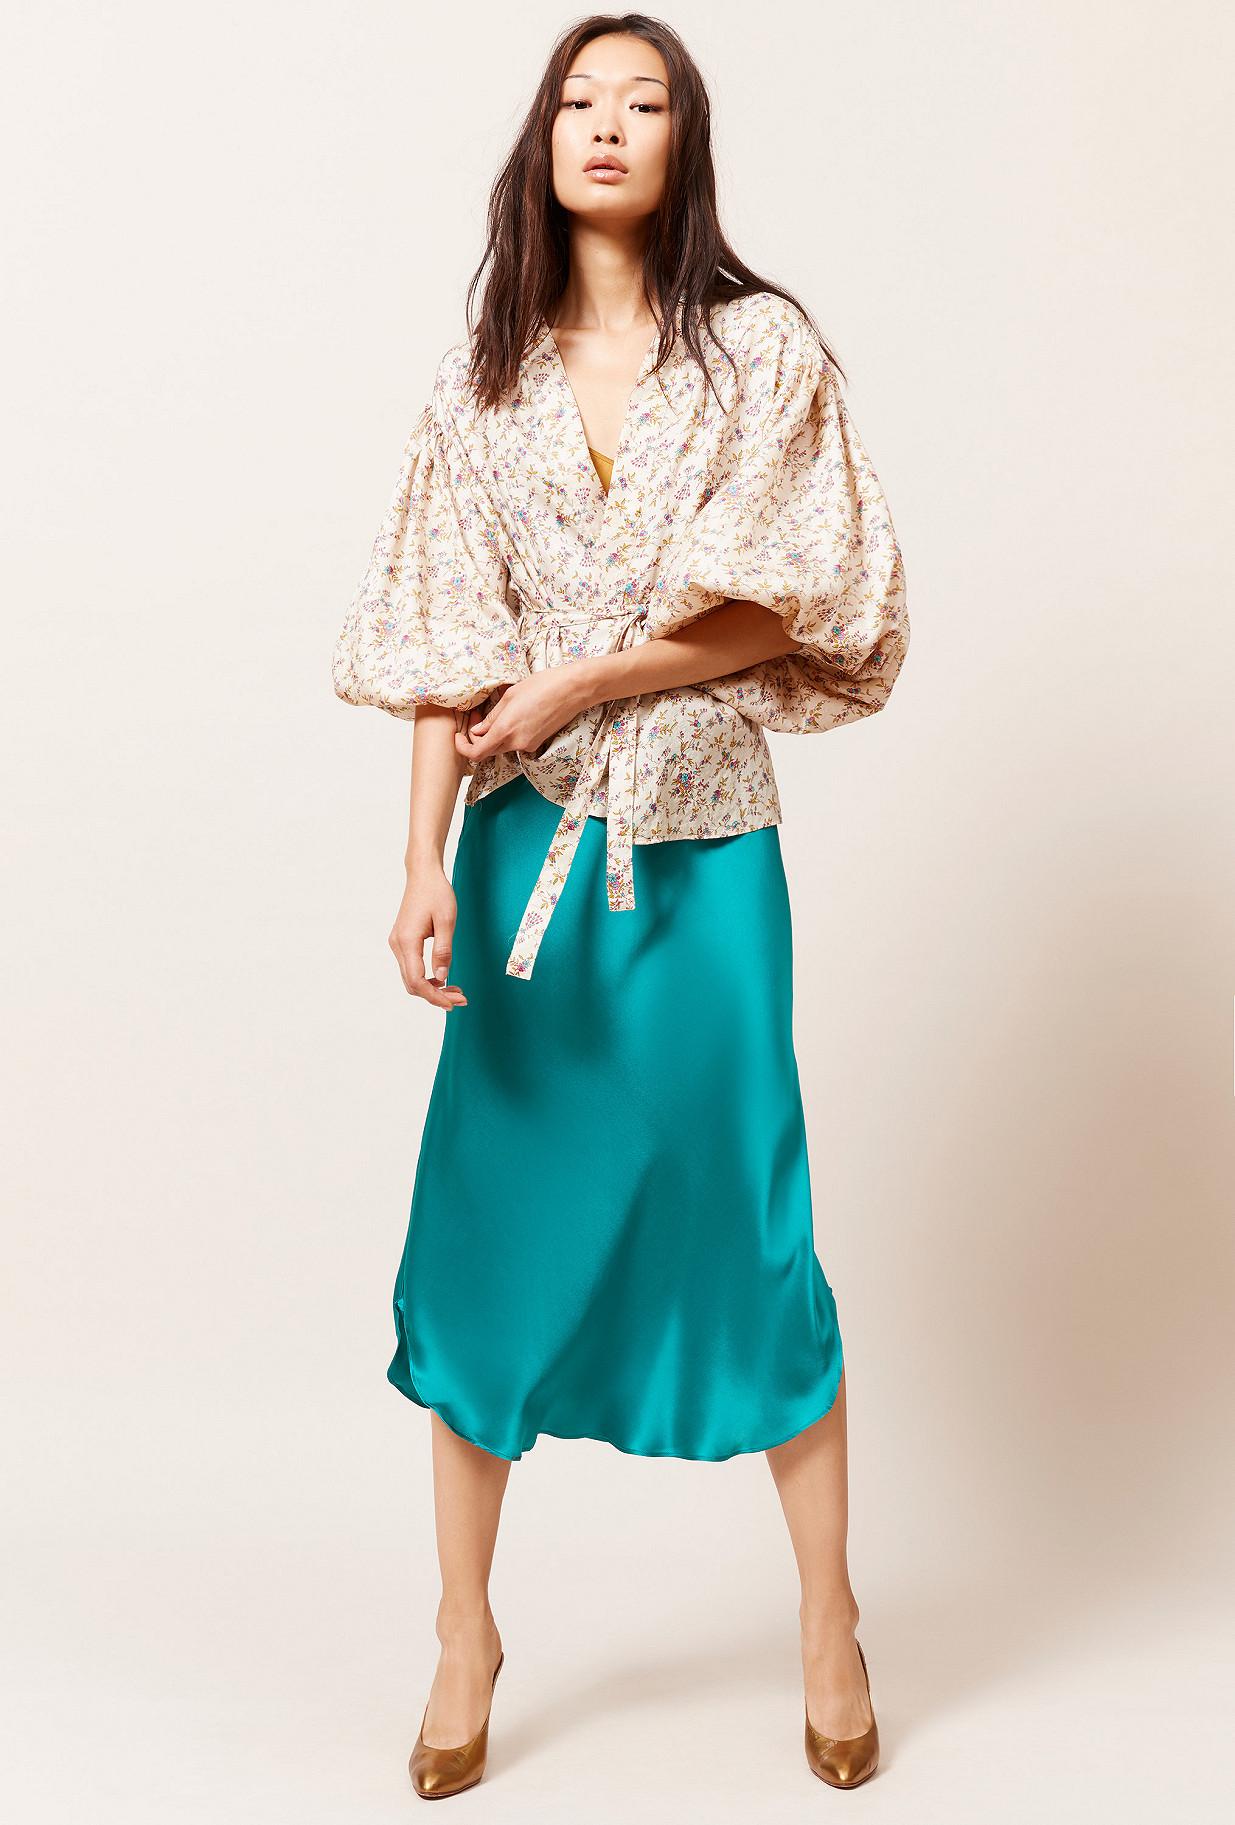 boutique de vetement Kimono createur boheme  Gondolfo